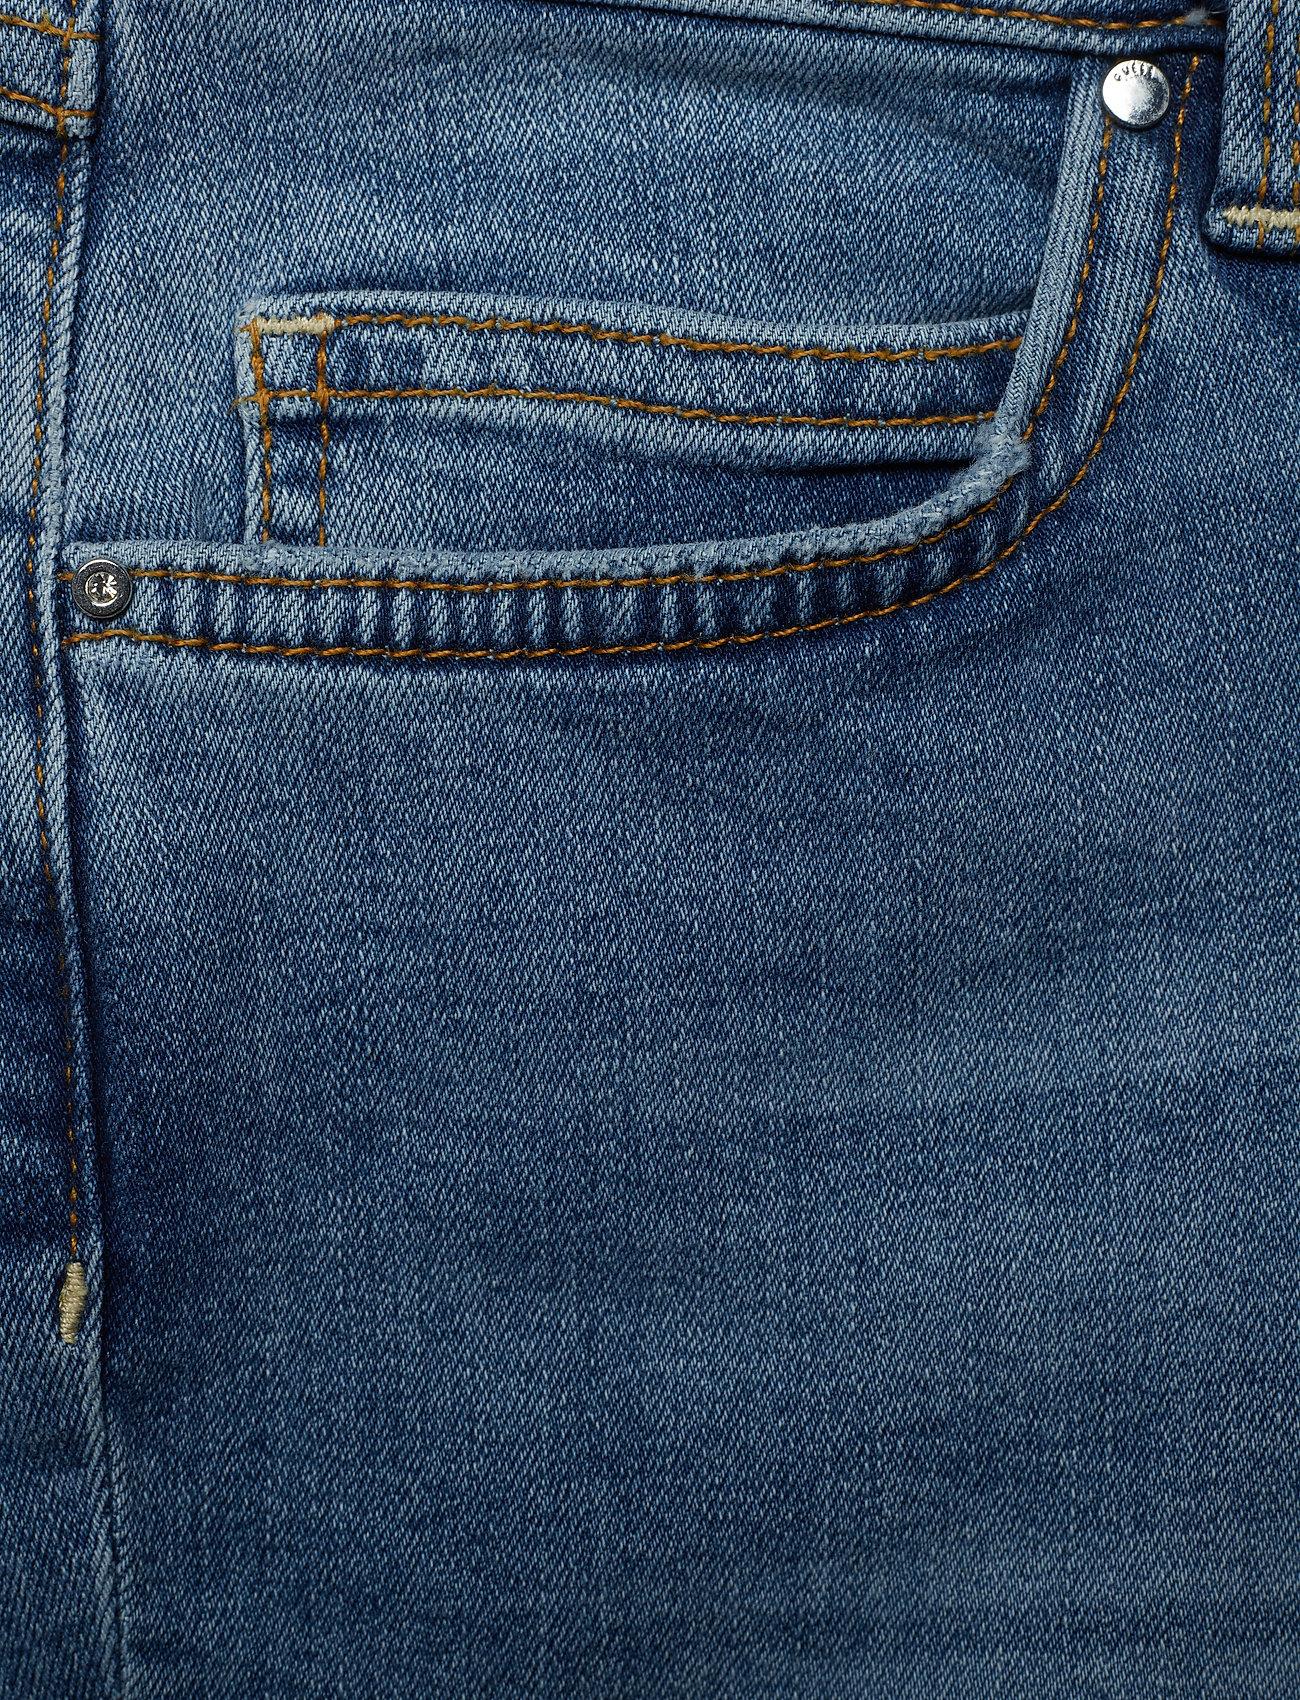 Marilynbling Jeans Marilynbling Marilynbling BlasterGuess Marilynbling BlasterGuess BlasterGuess BlasterGuess Jeans Jeans Jeans rhQdxCts